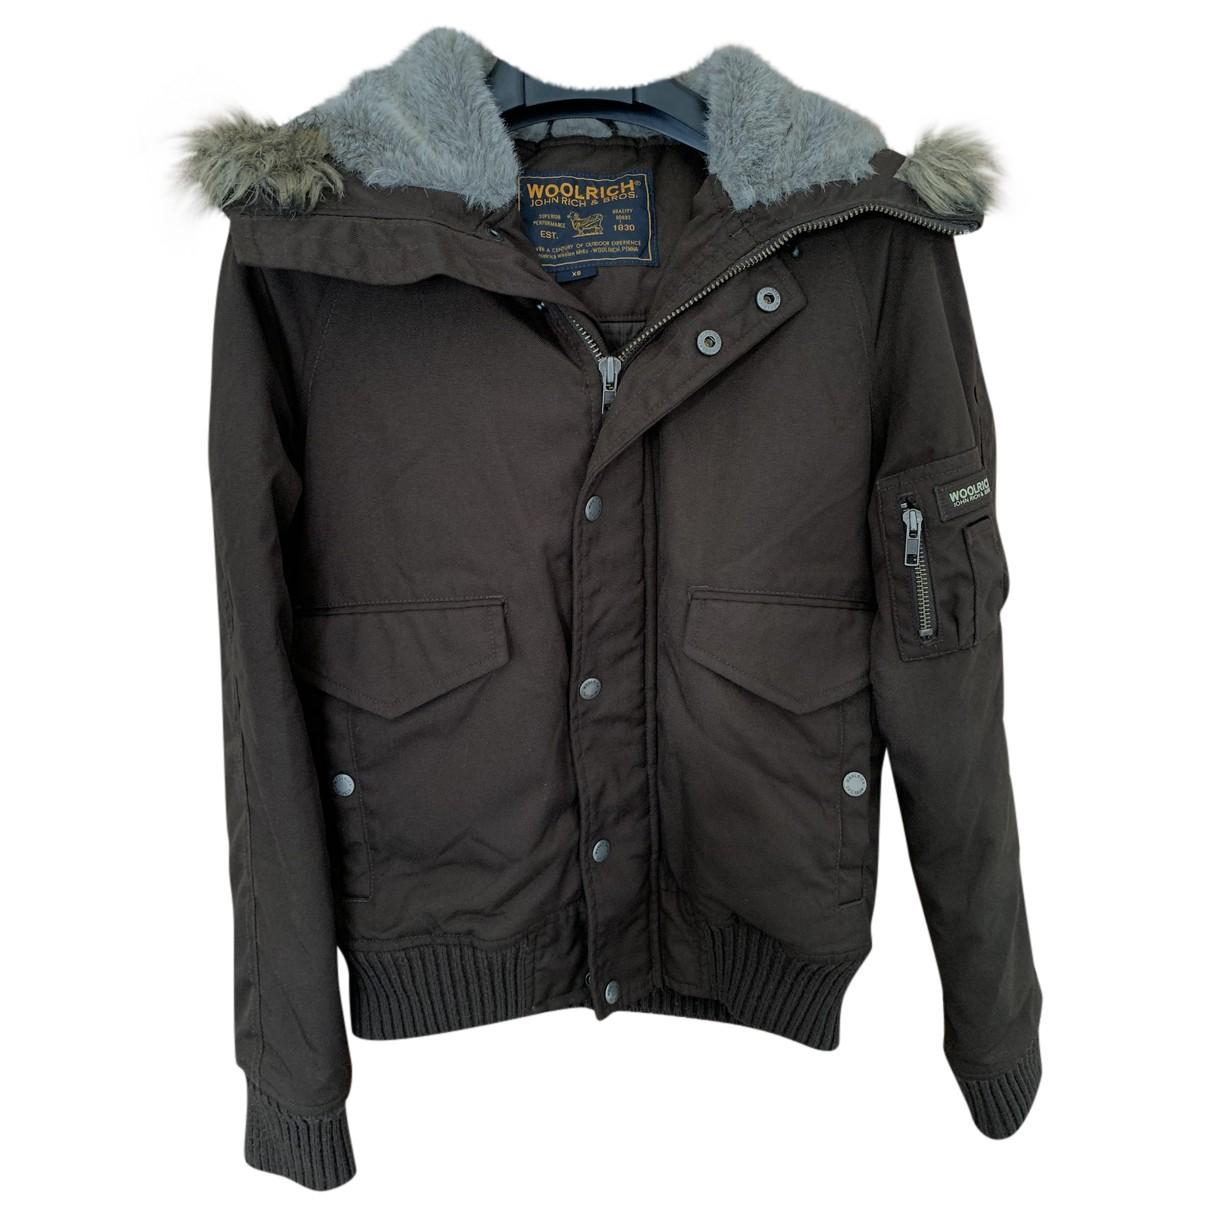 Woolrich N Brown jacket for Women XS International